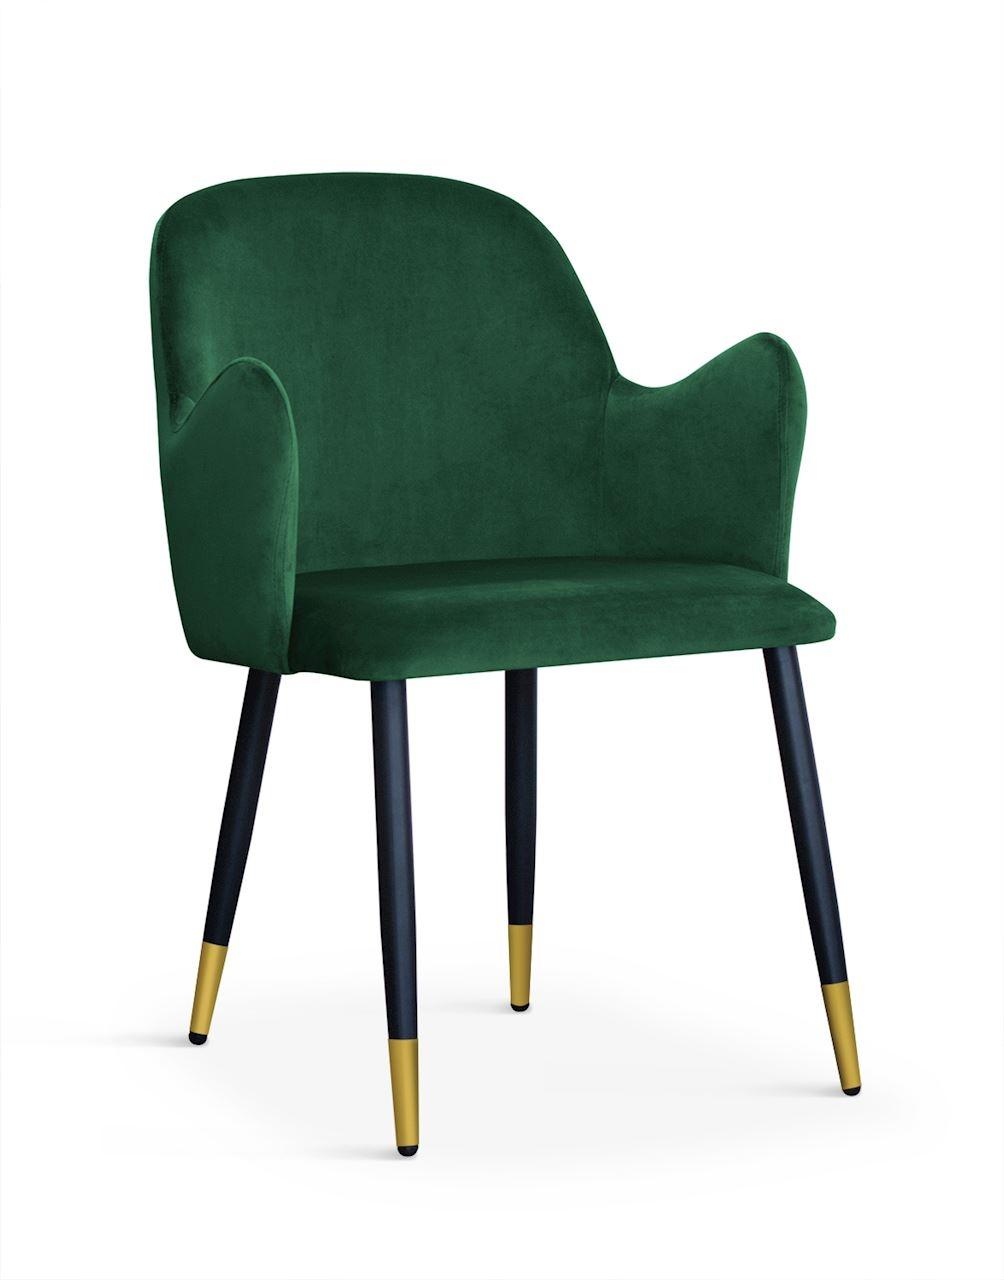 Scaun tapitat cu stofa si picioare metalice Camel Velvet Verde / Negru / Auriu, l58xA63xH84 cm imagine